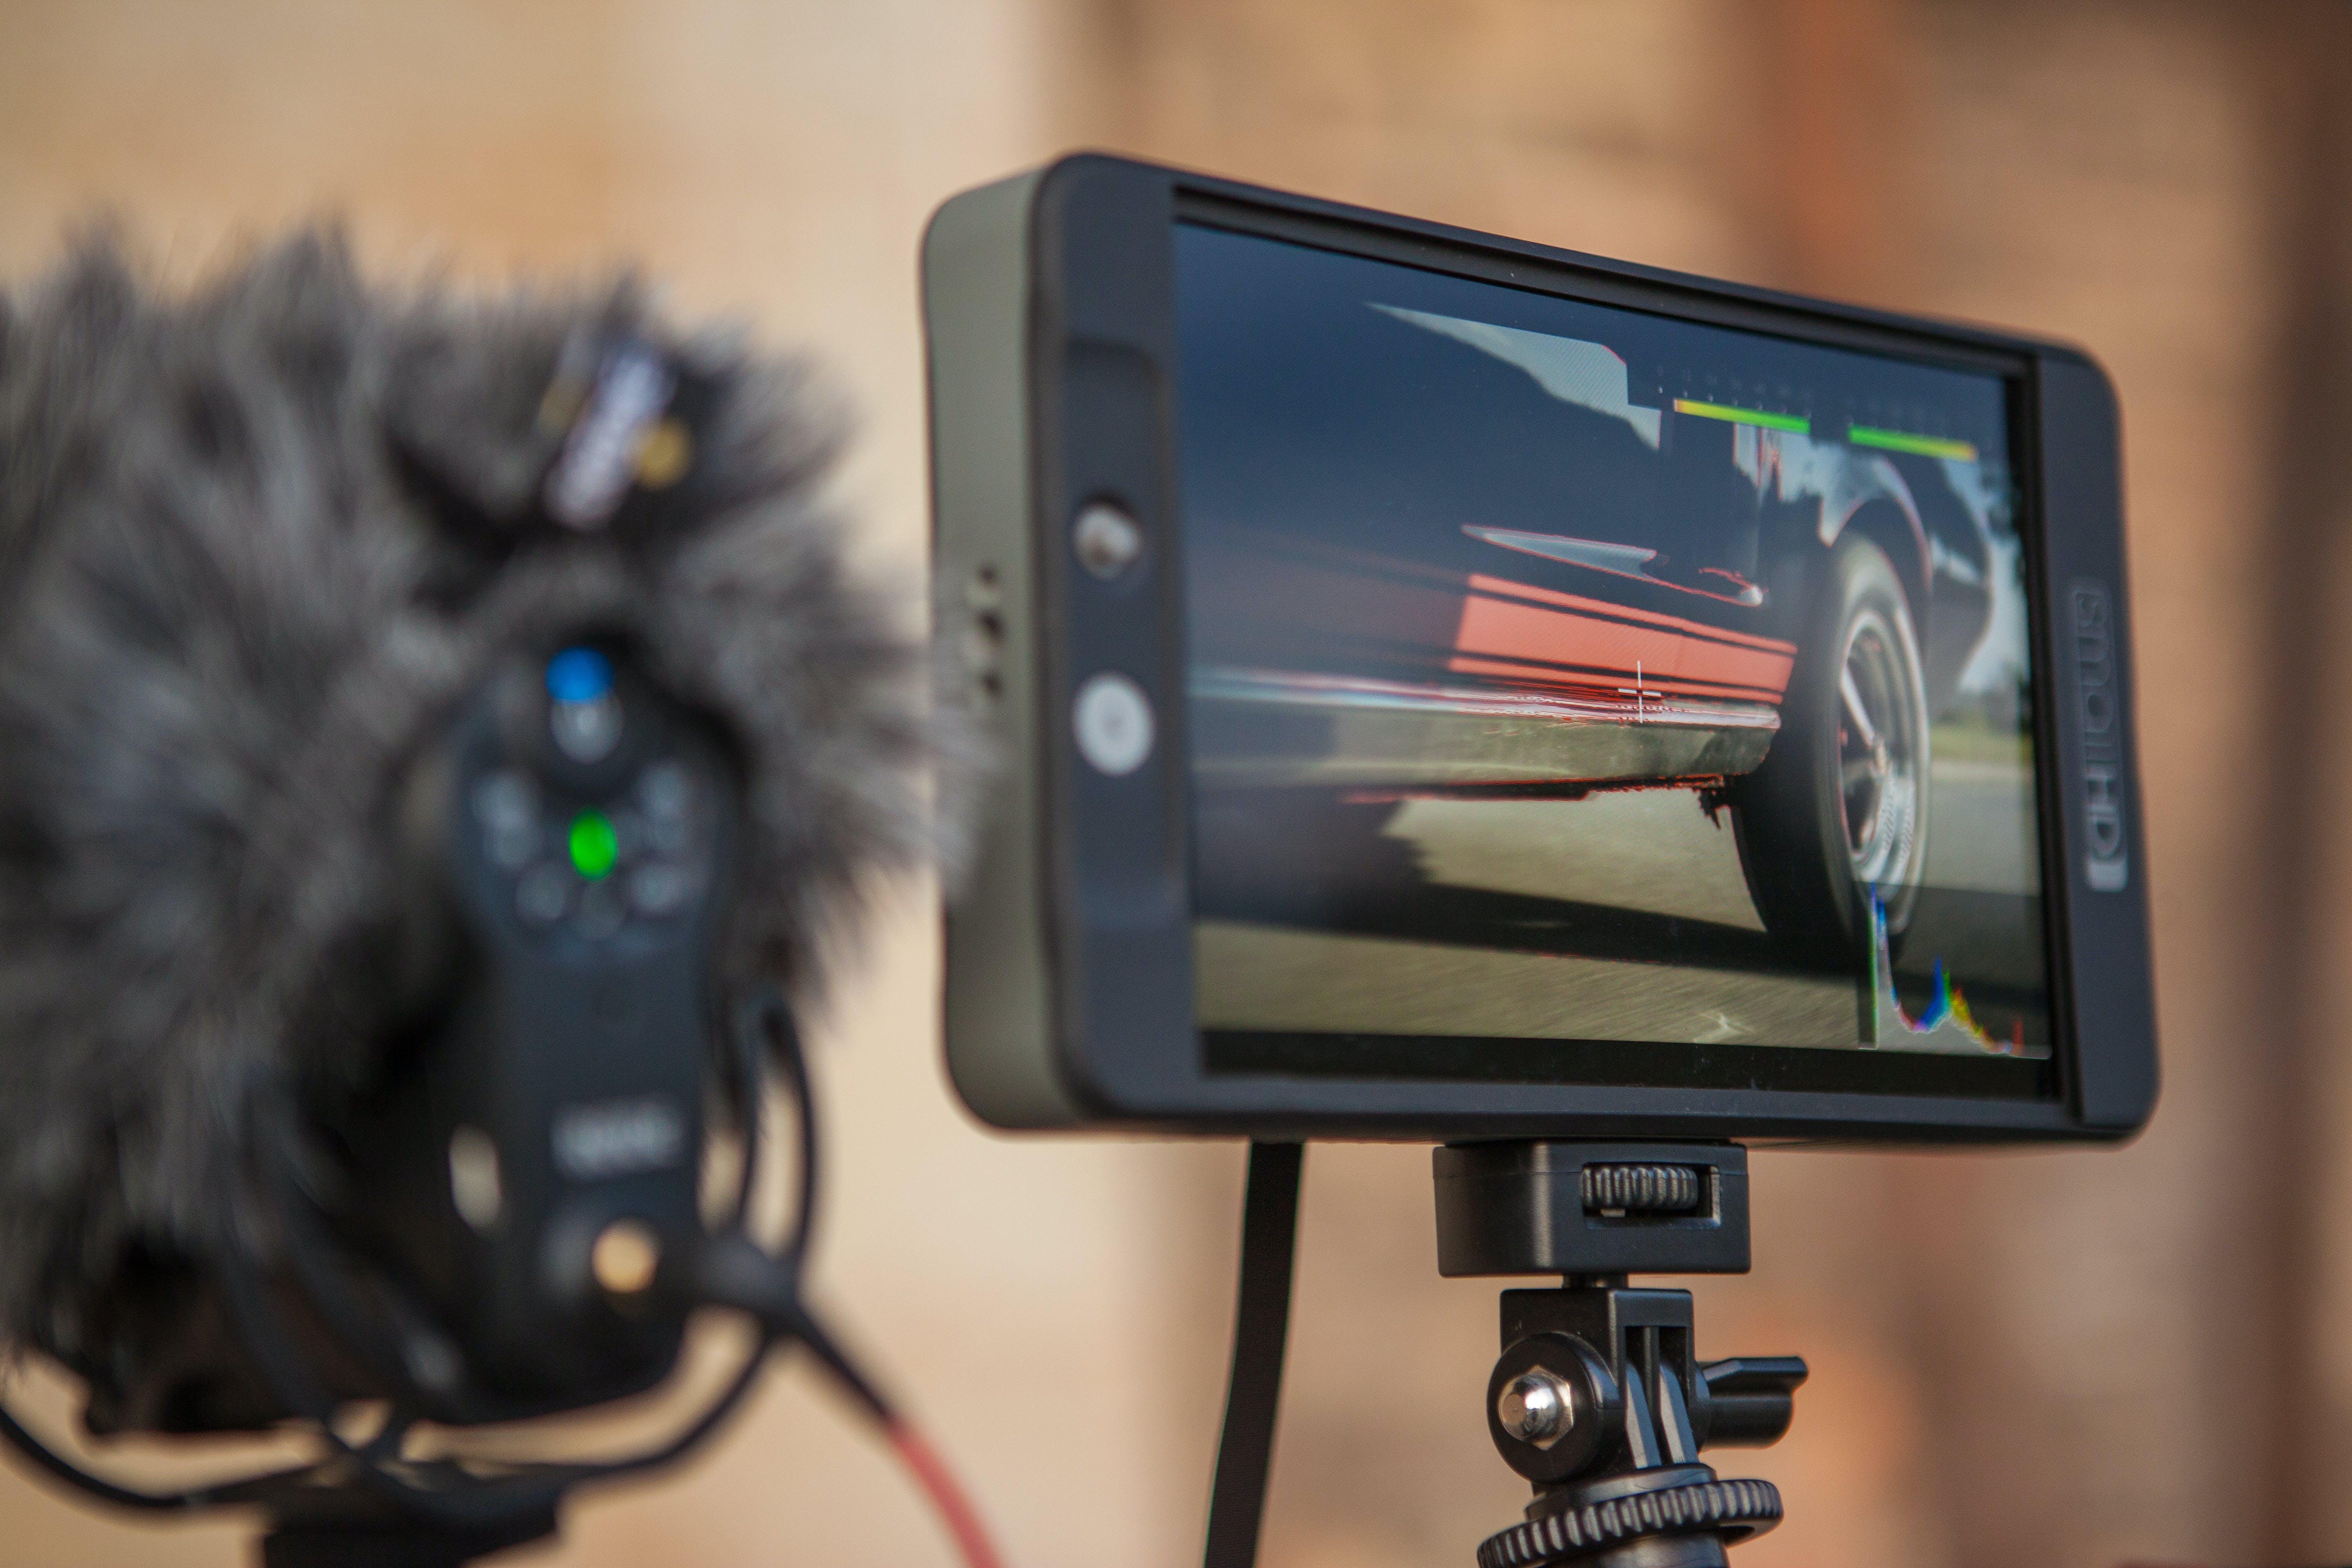 Black Android Smartphone On Selfie Stick